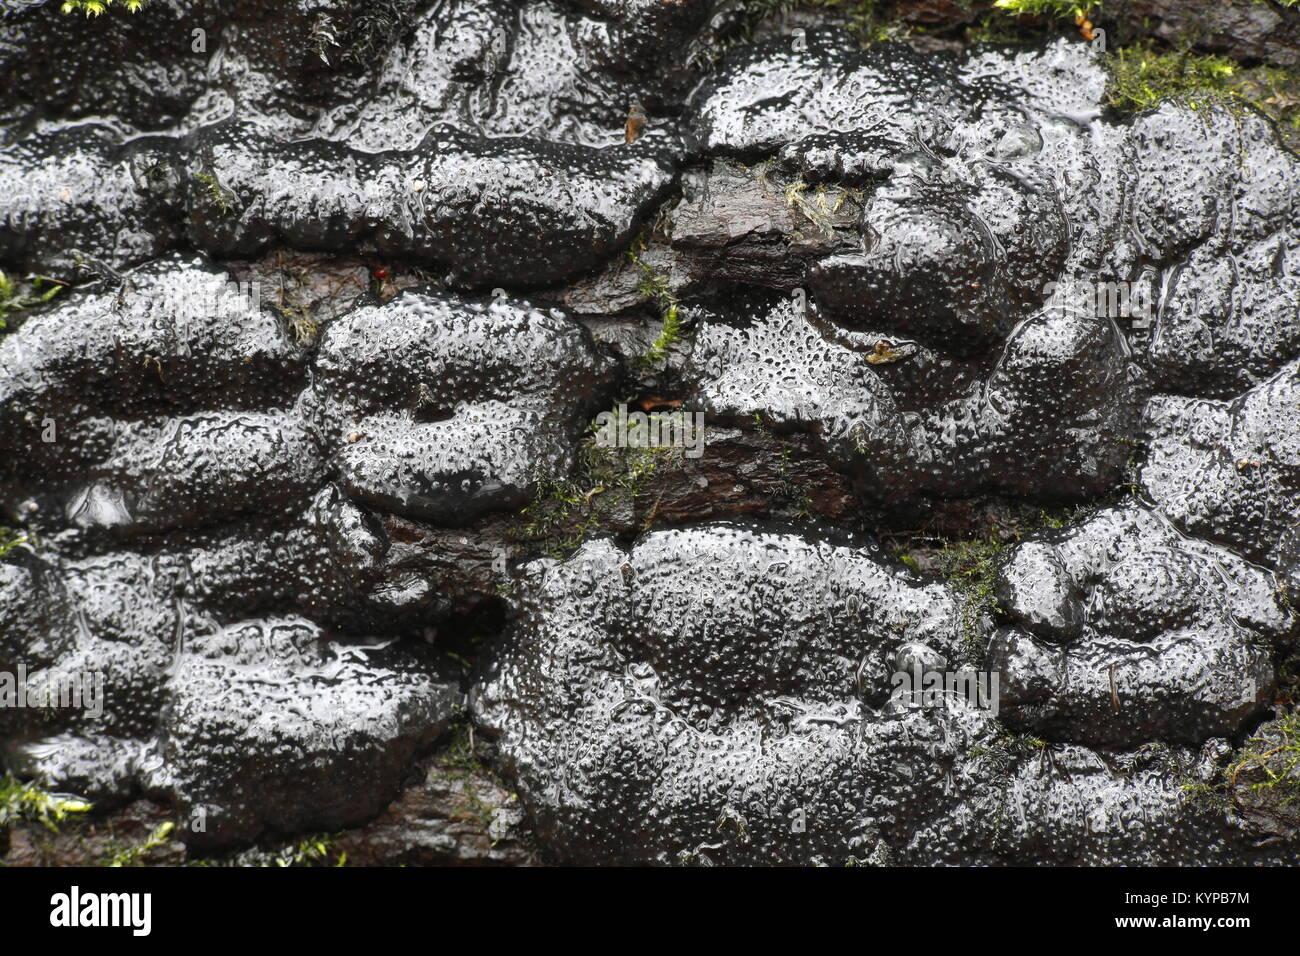 Brittle cinder fungus, Kretzschmaria deusta, very serious plant pathogen destroying park trees - Stock Image